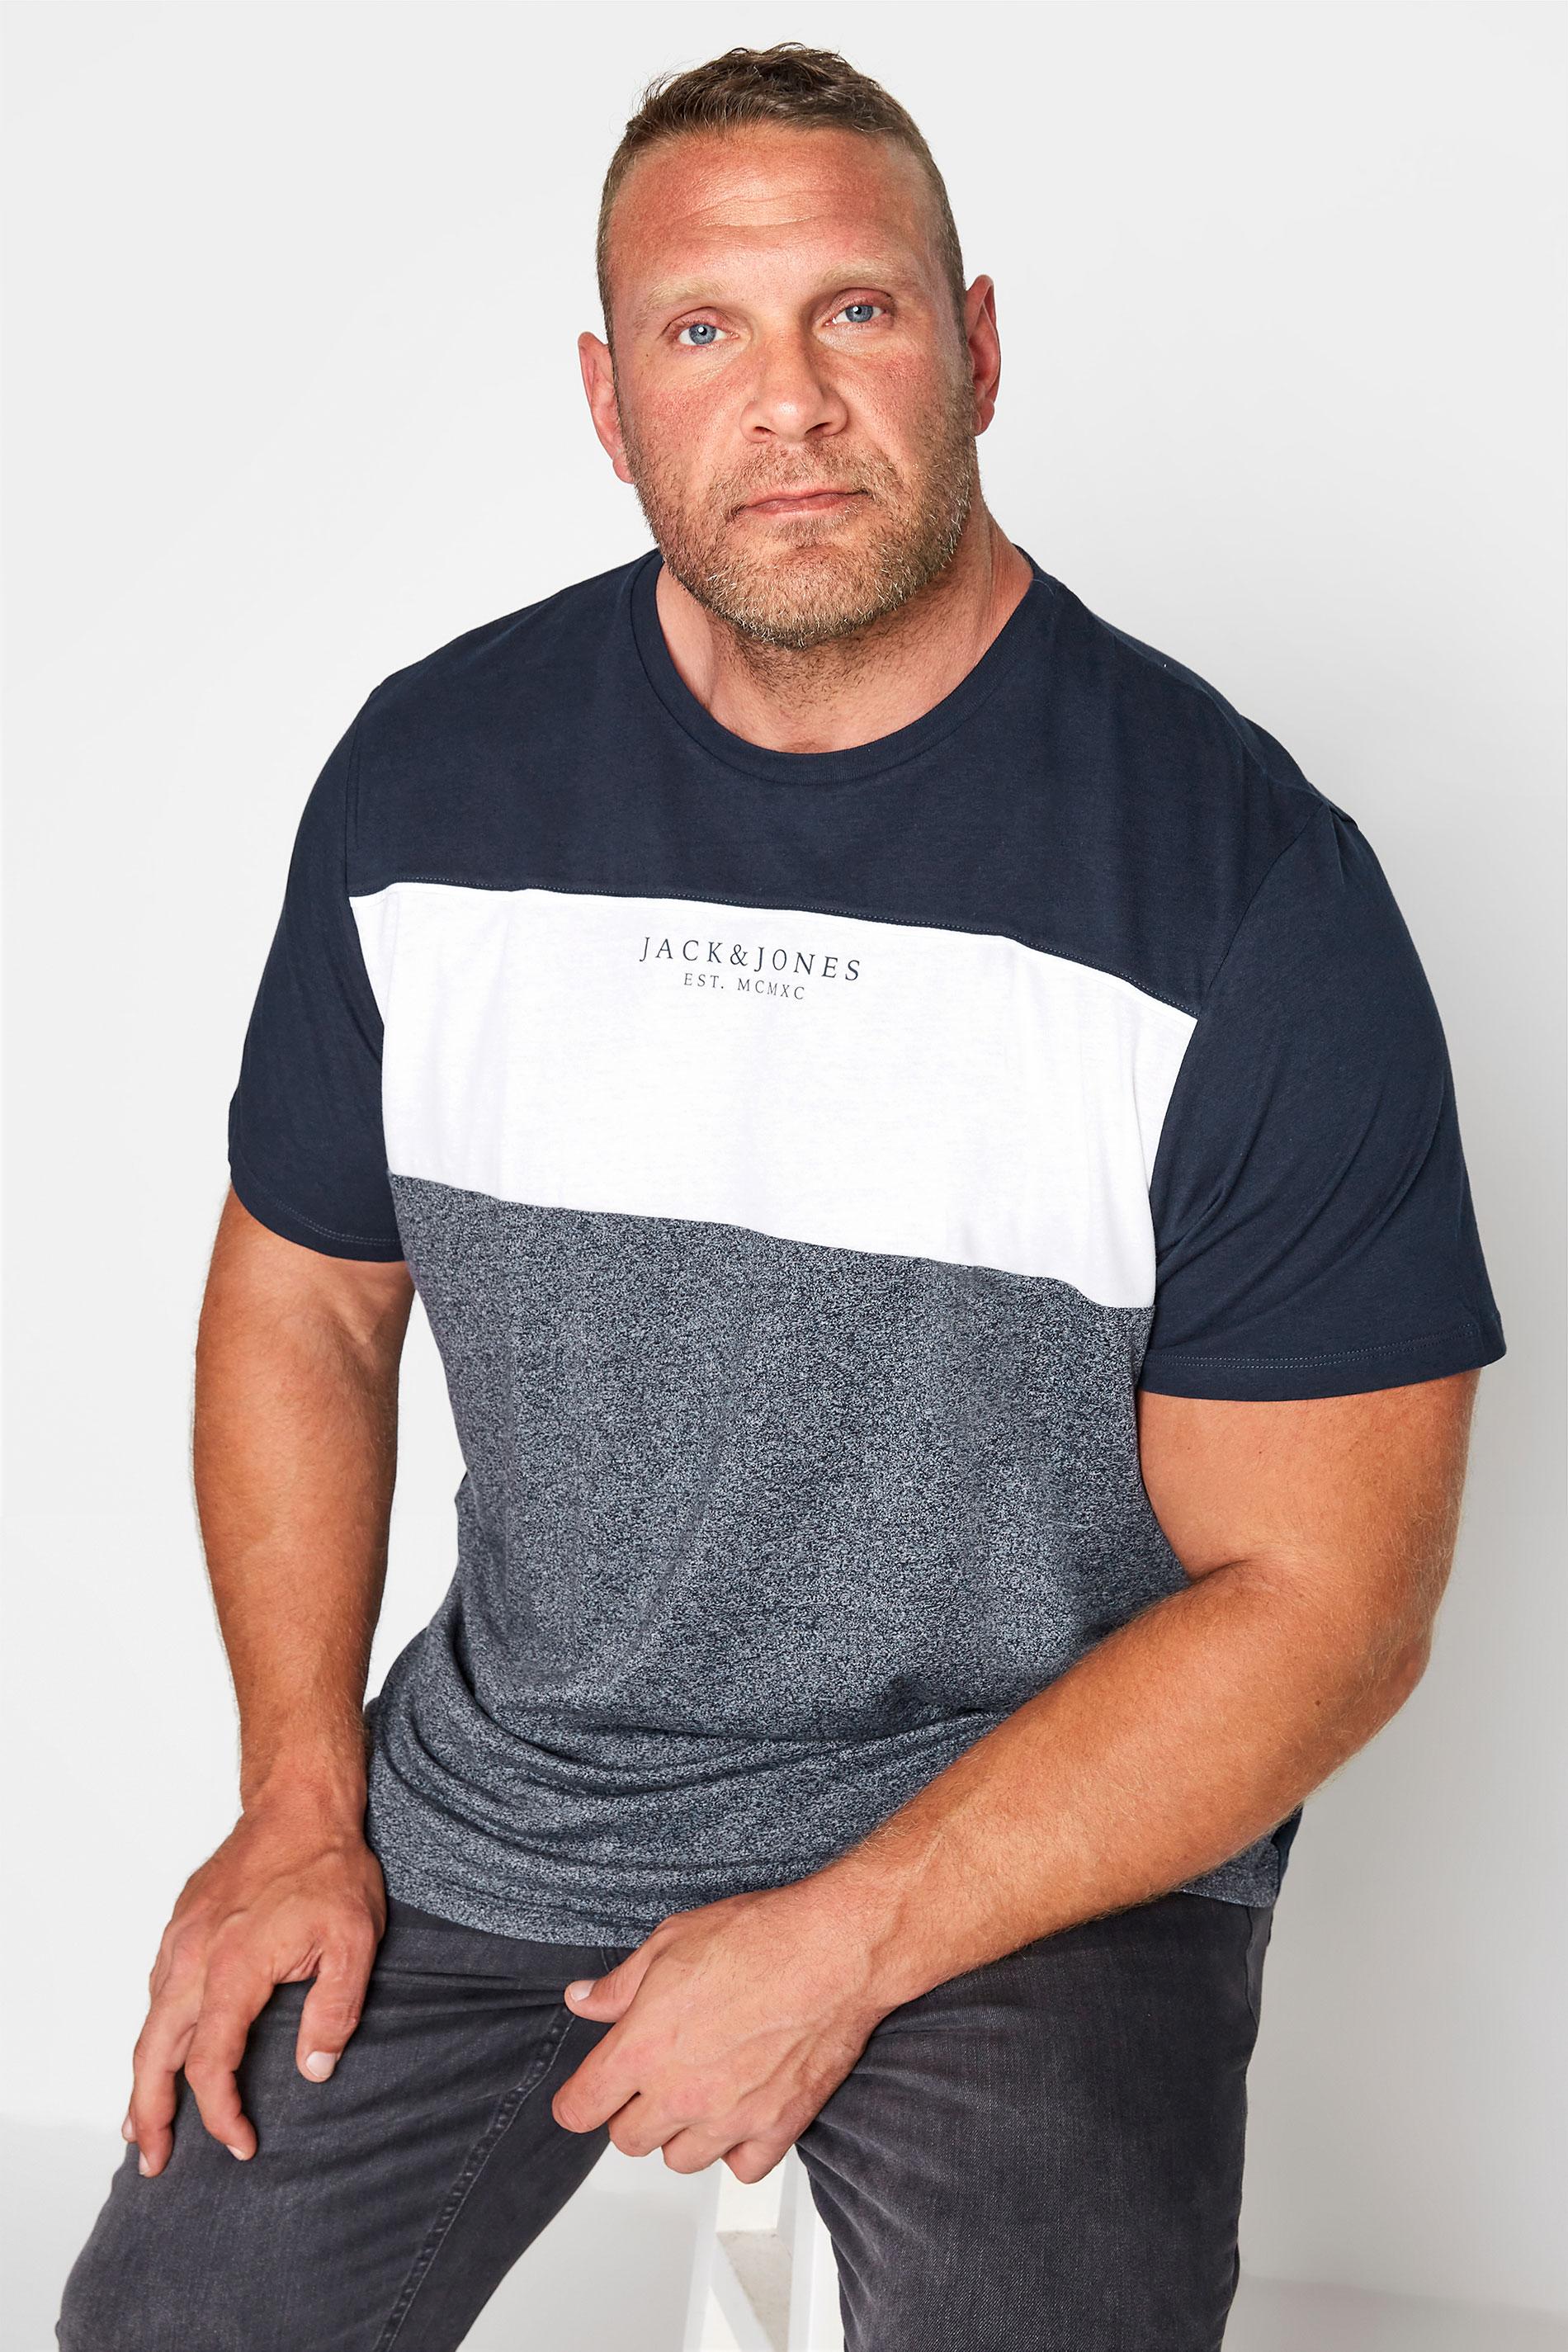 JACK & JONES Navy Monse T-Shirt_M.jpg